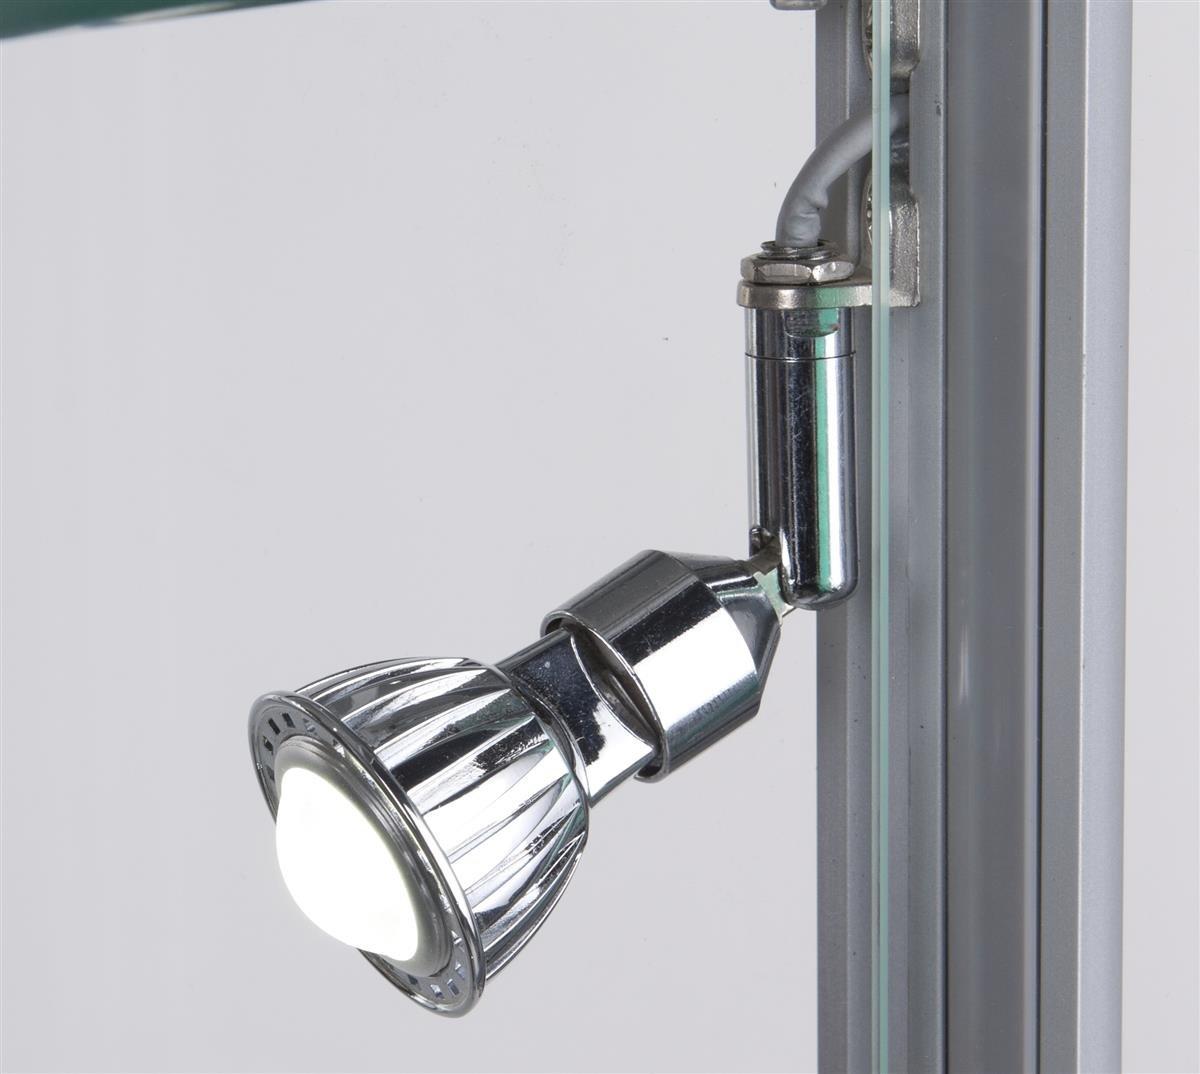 Glass Curio Cabinets With Lights Amazoncom Tempered Glass Curio Cabinet With 8 Halogen Lights 78